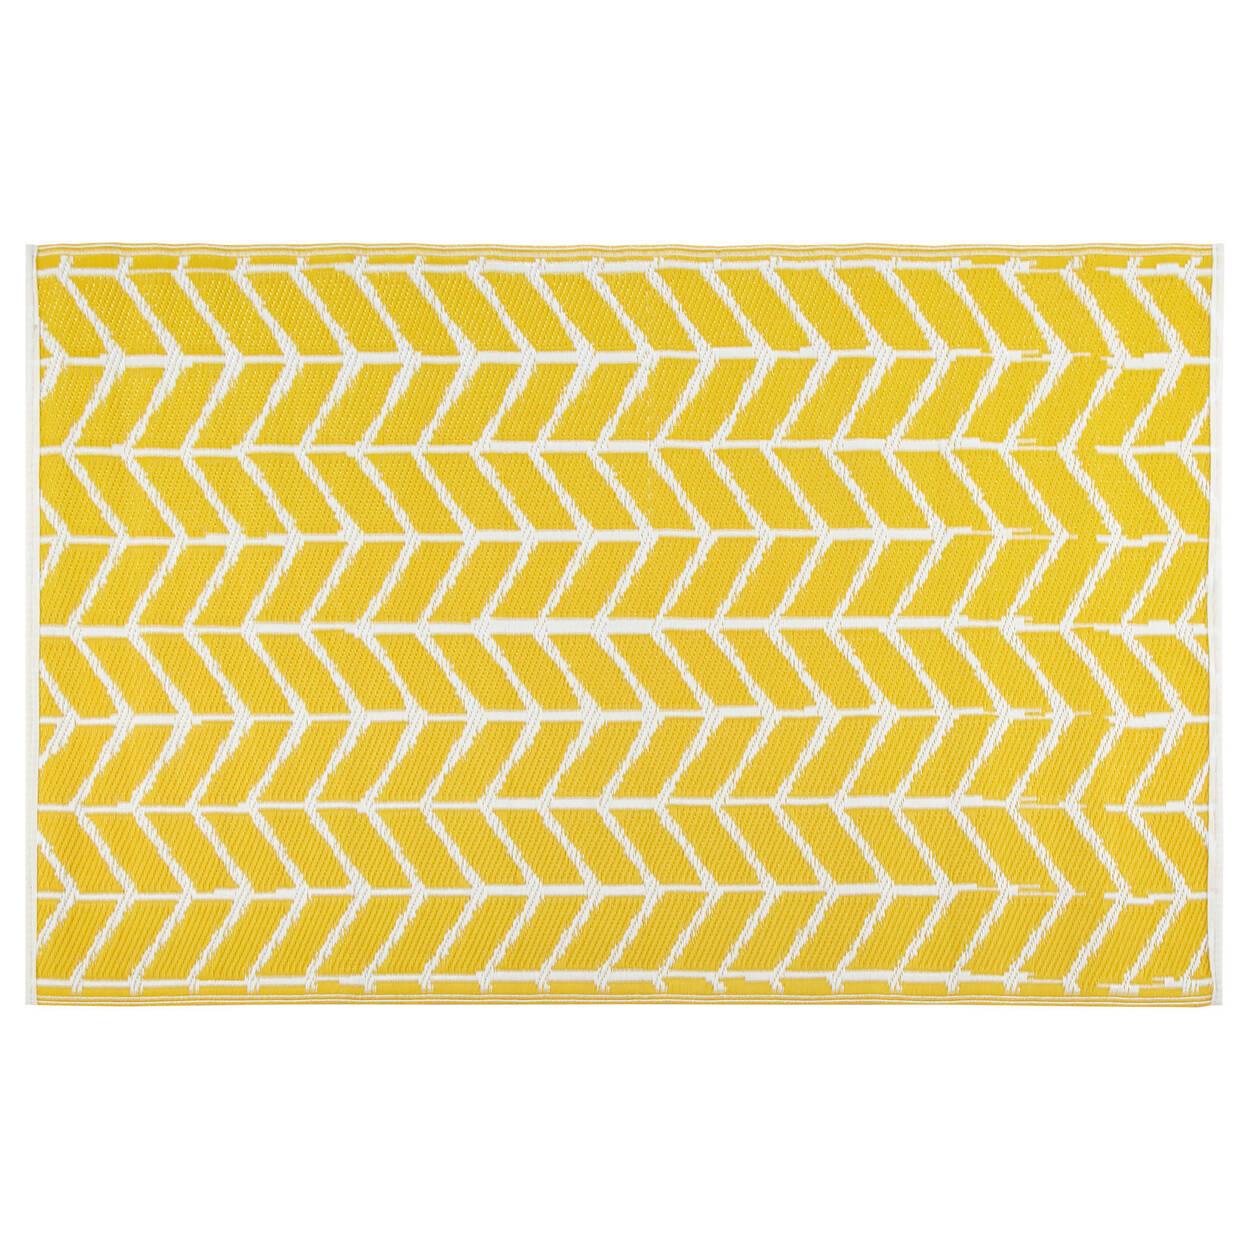 Medium Yellow Outdoor Rug